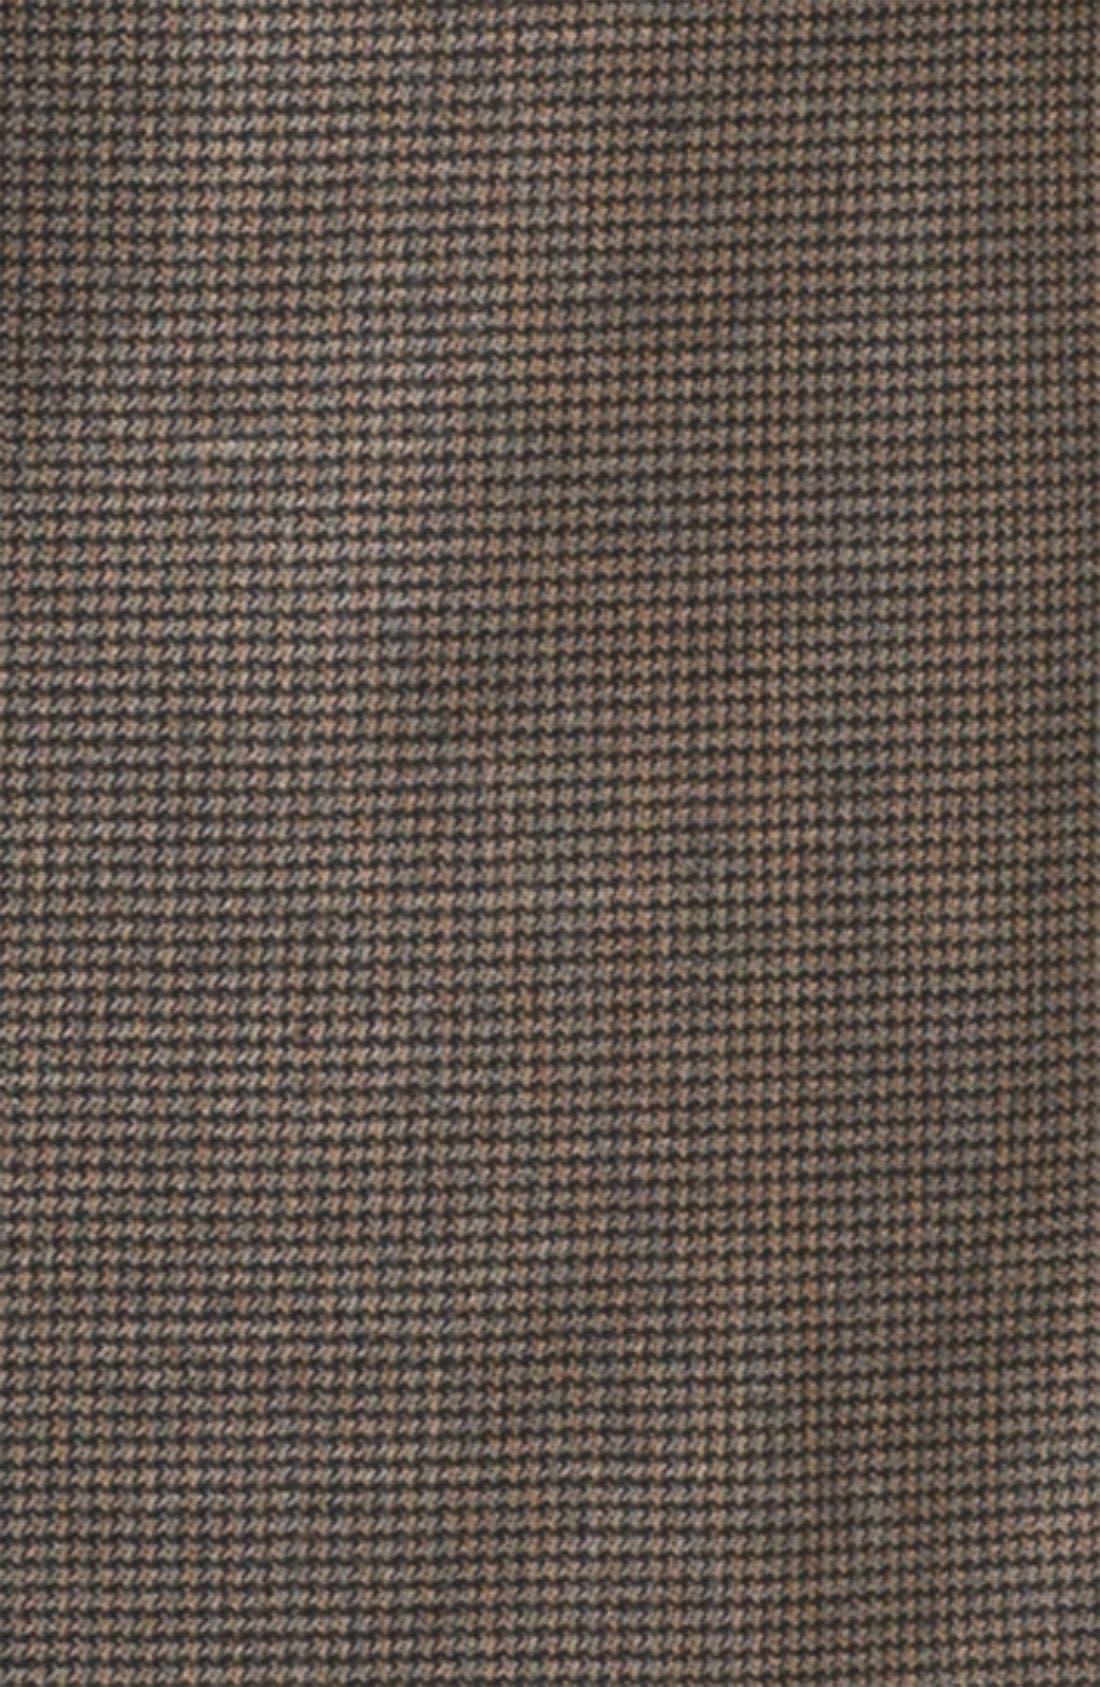 Alternate Image 3  - Joseph Abboud 'Signature Silver' Houndstooth Sportcoat